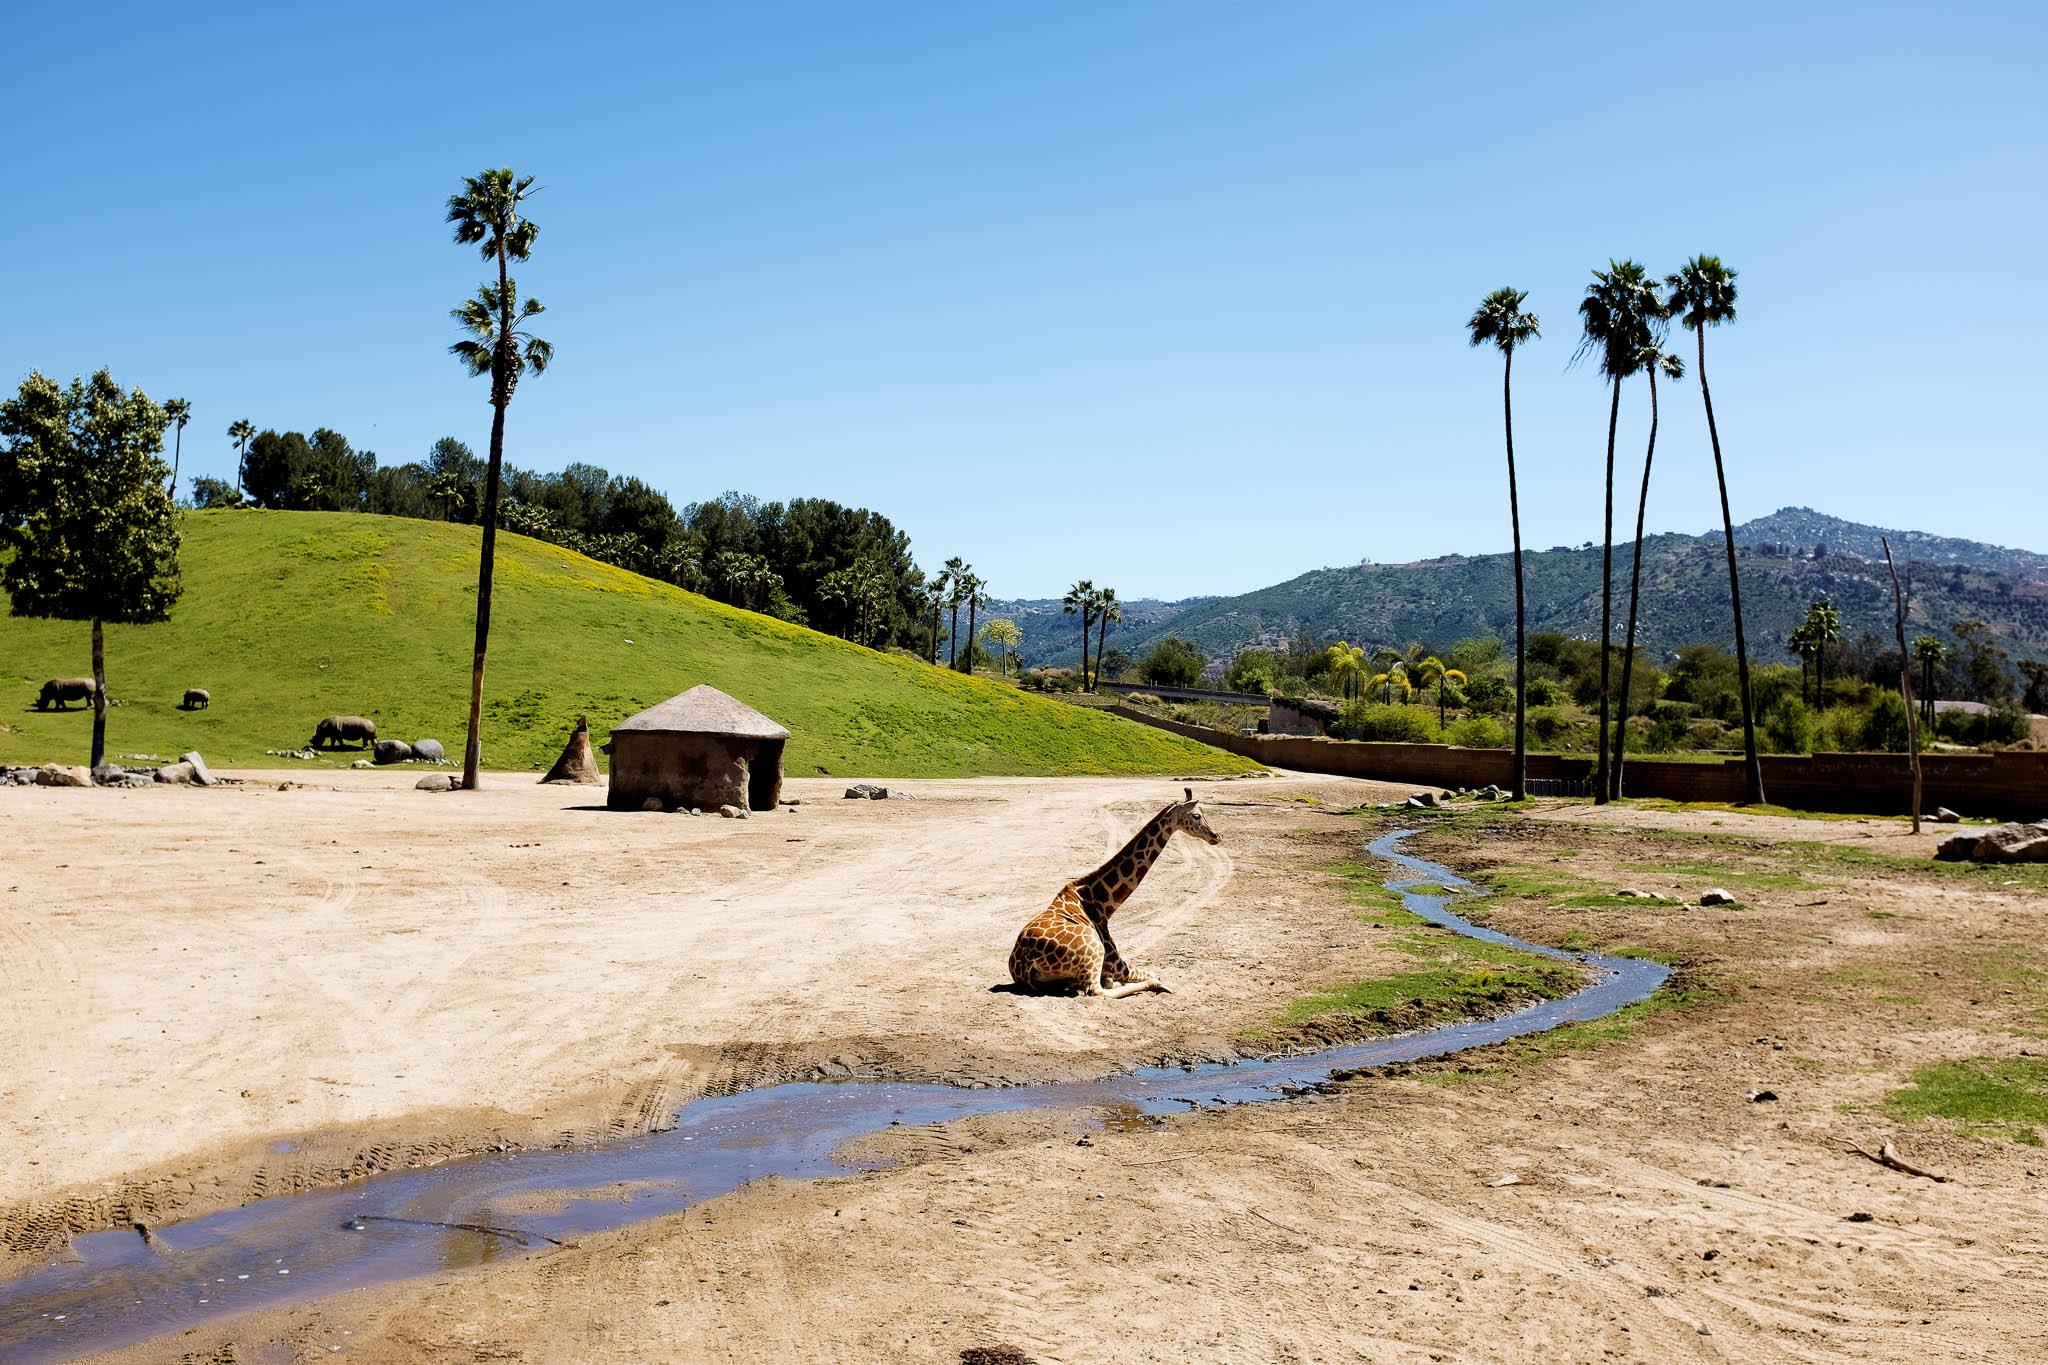 San Diego Safari Park-2016--5.jpg